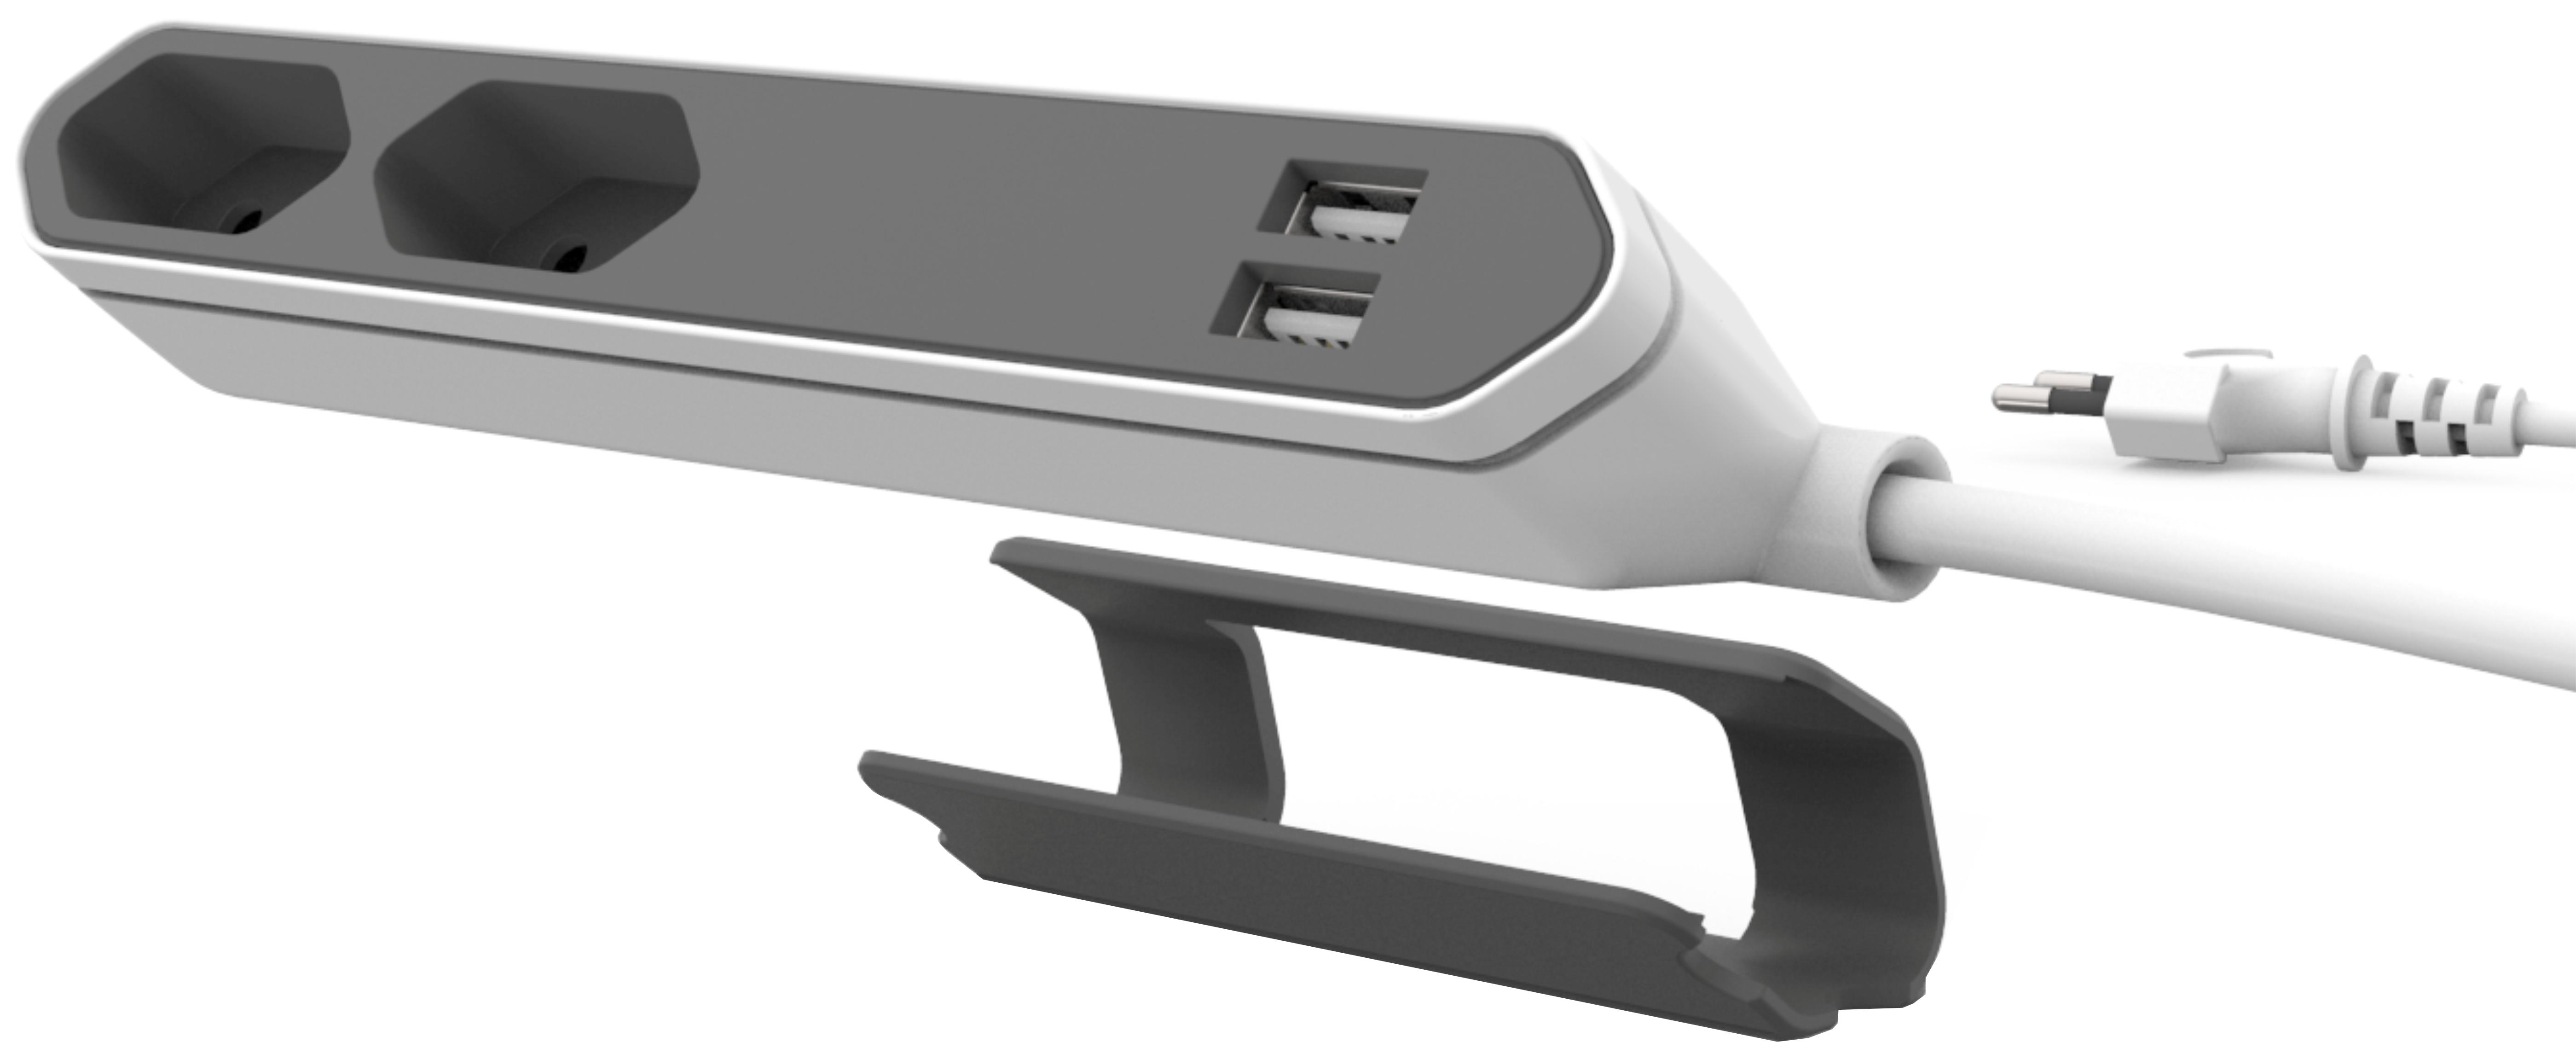 Prelungitor 2 prize EU+ 2 USB, 2.1A, 1.5m, PowerBar, Allocacoc [0]